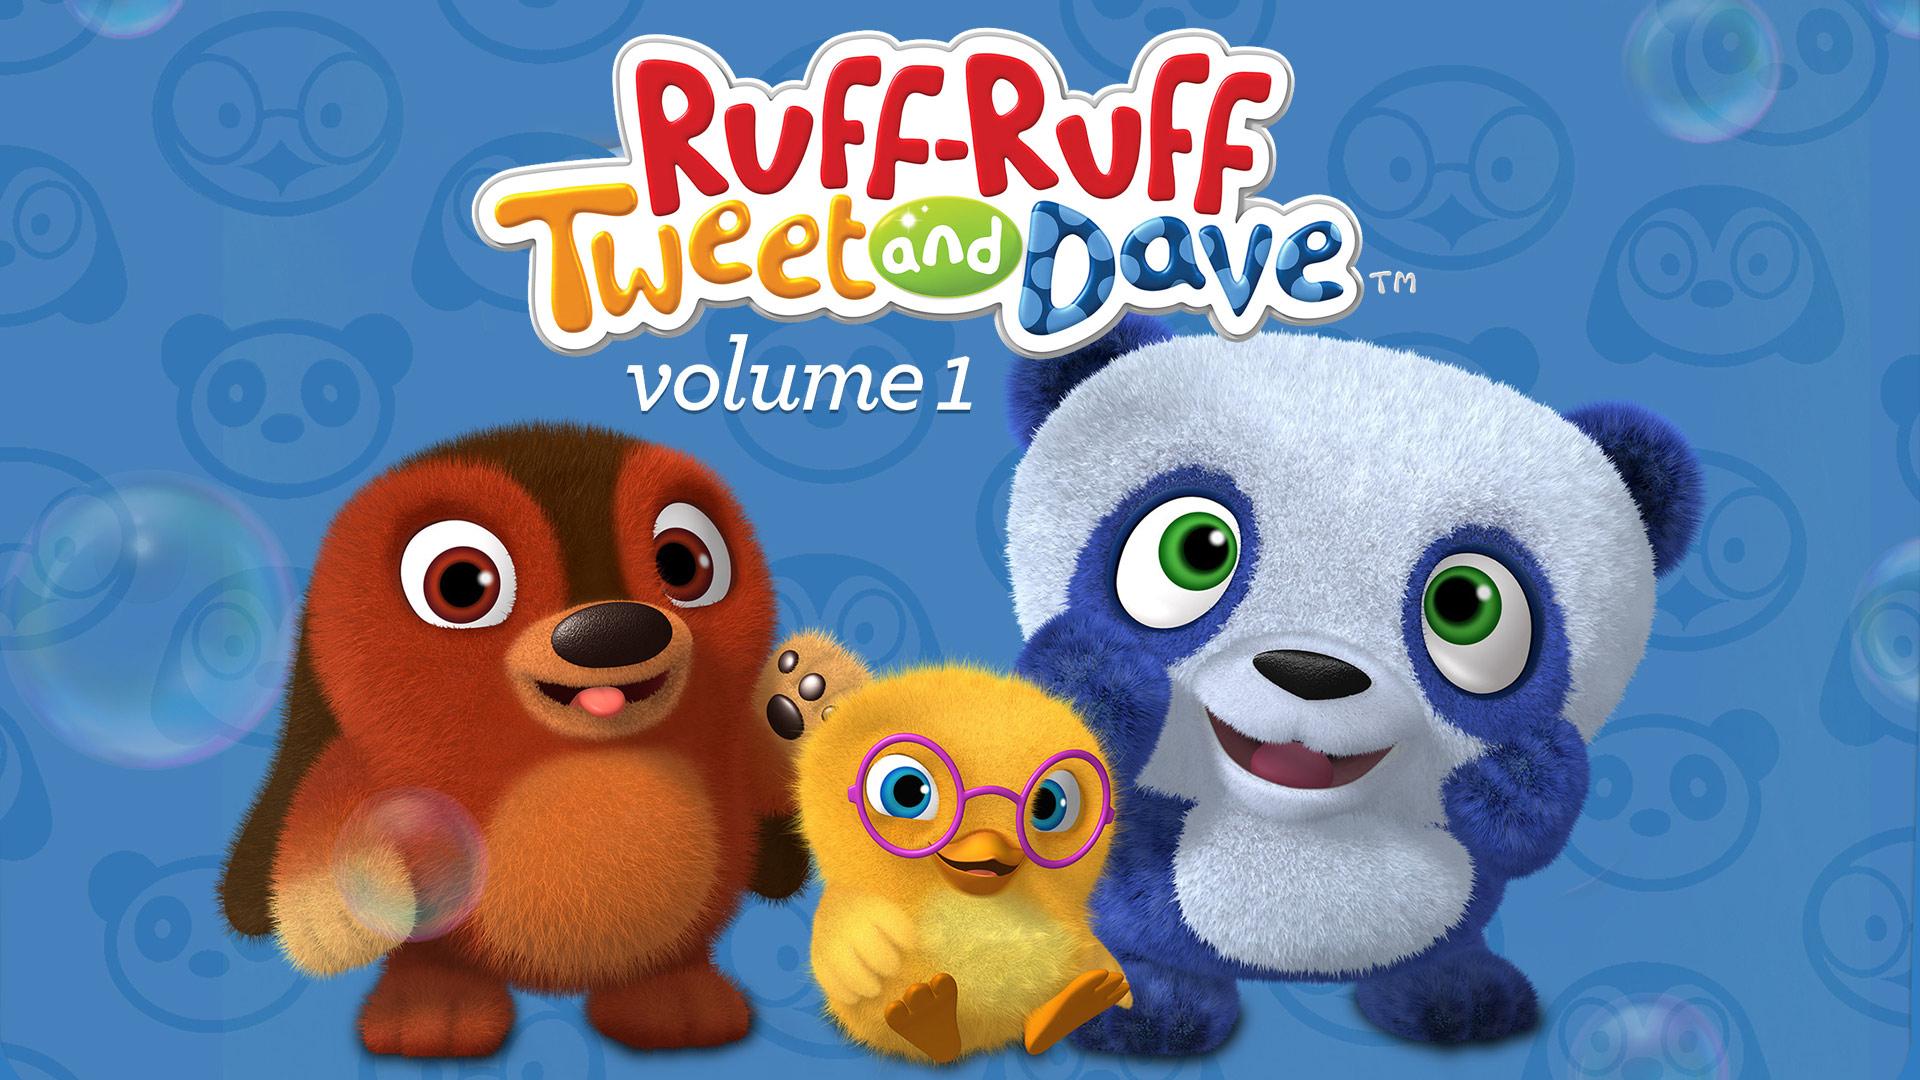 Ruff-Ruff, Tweet And Dave, Vol. 1